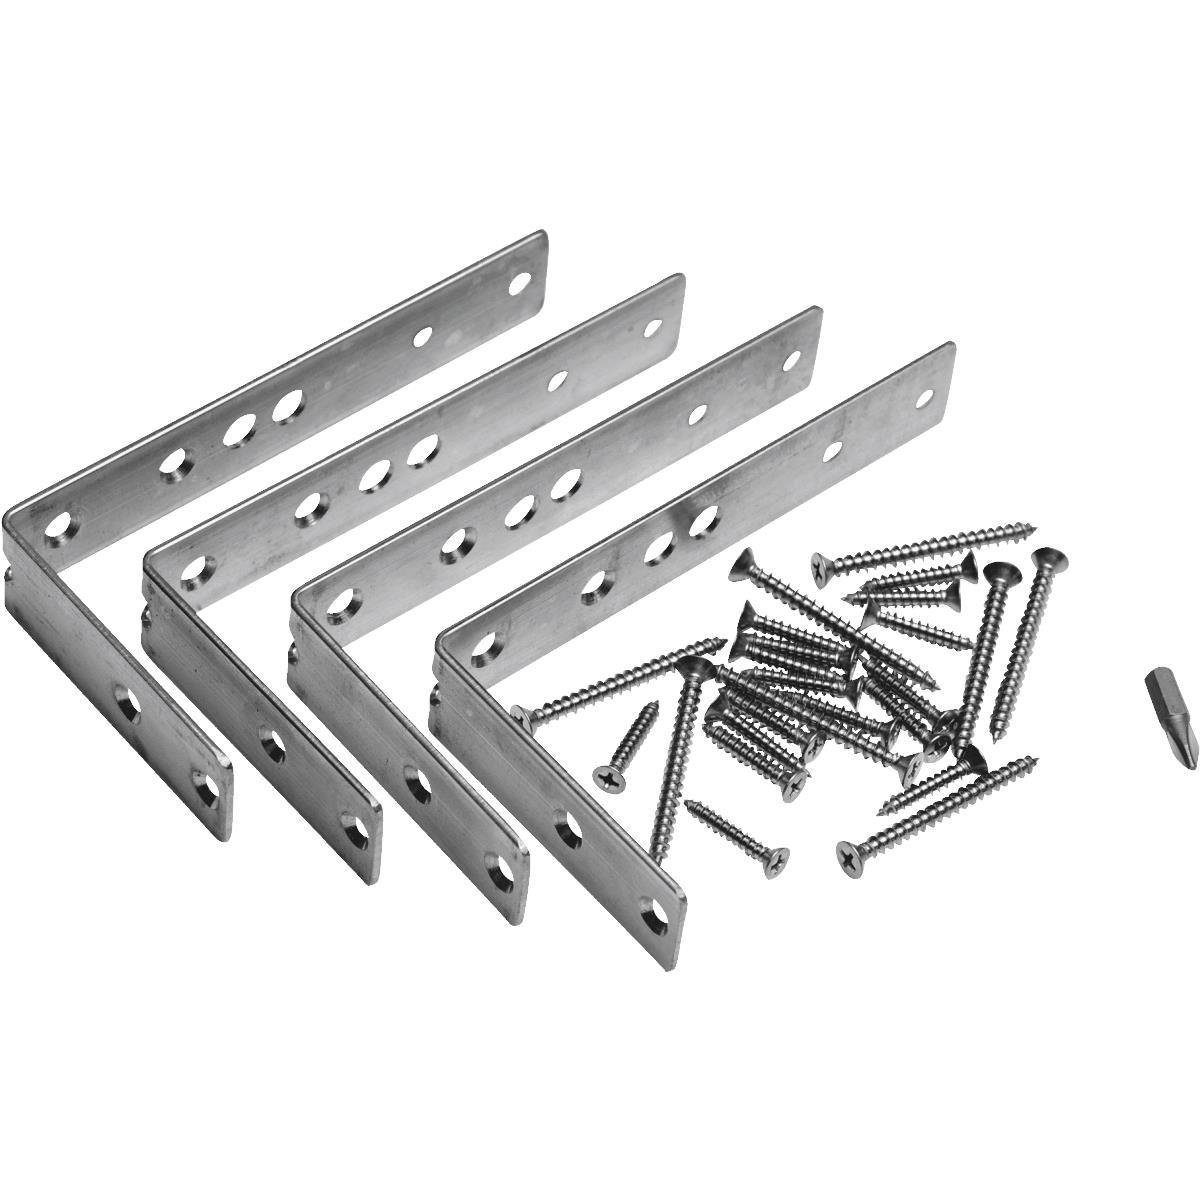 Buy Deckorators Multi Angle Rail Bracket Hardware Kit